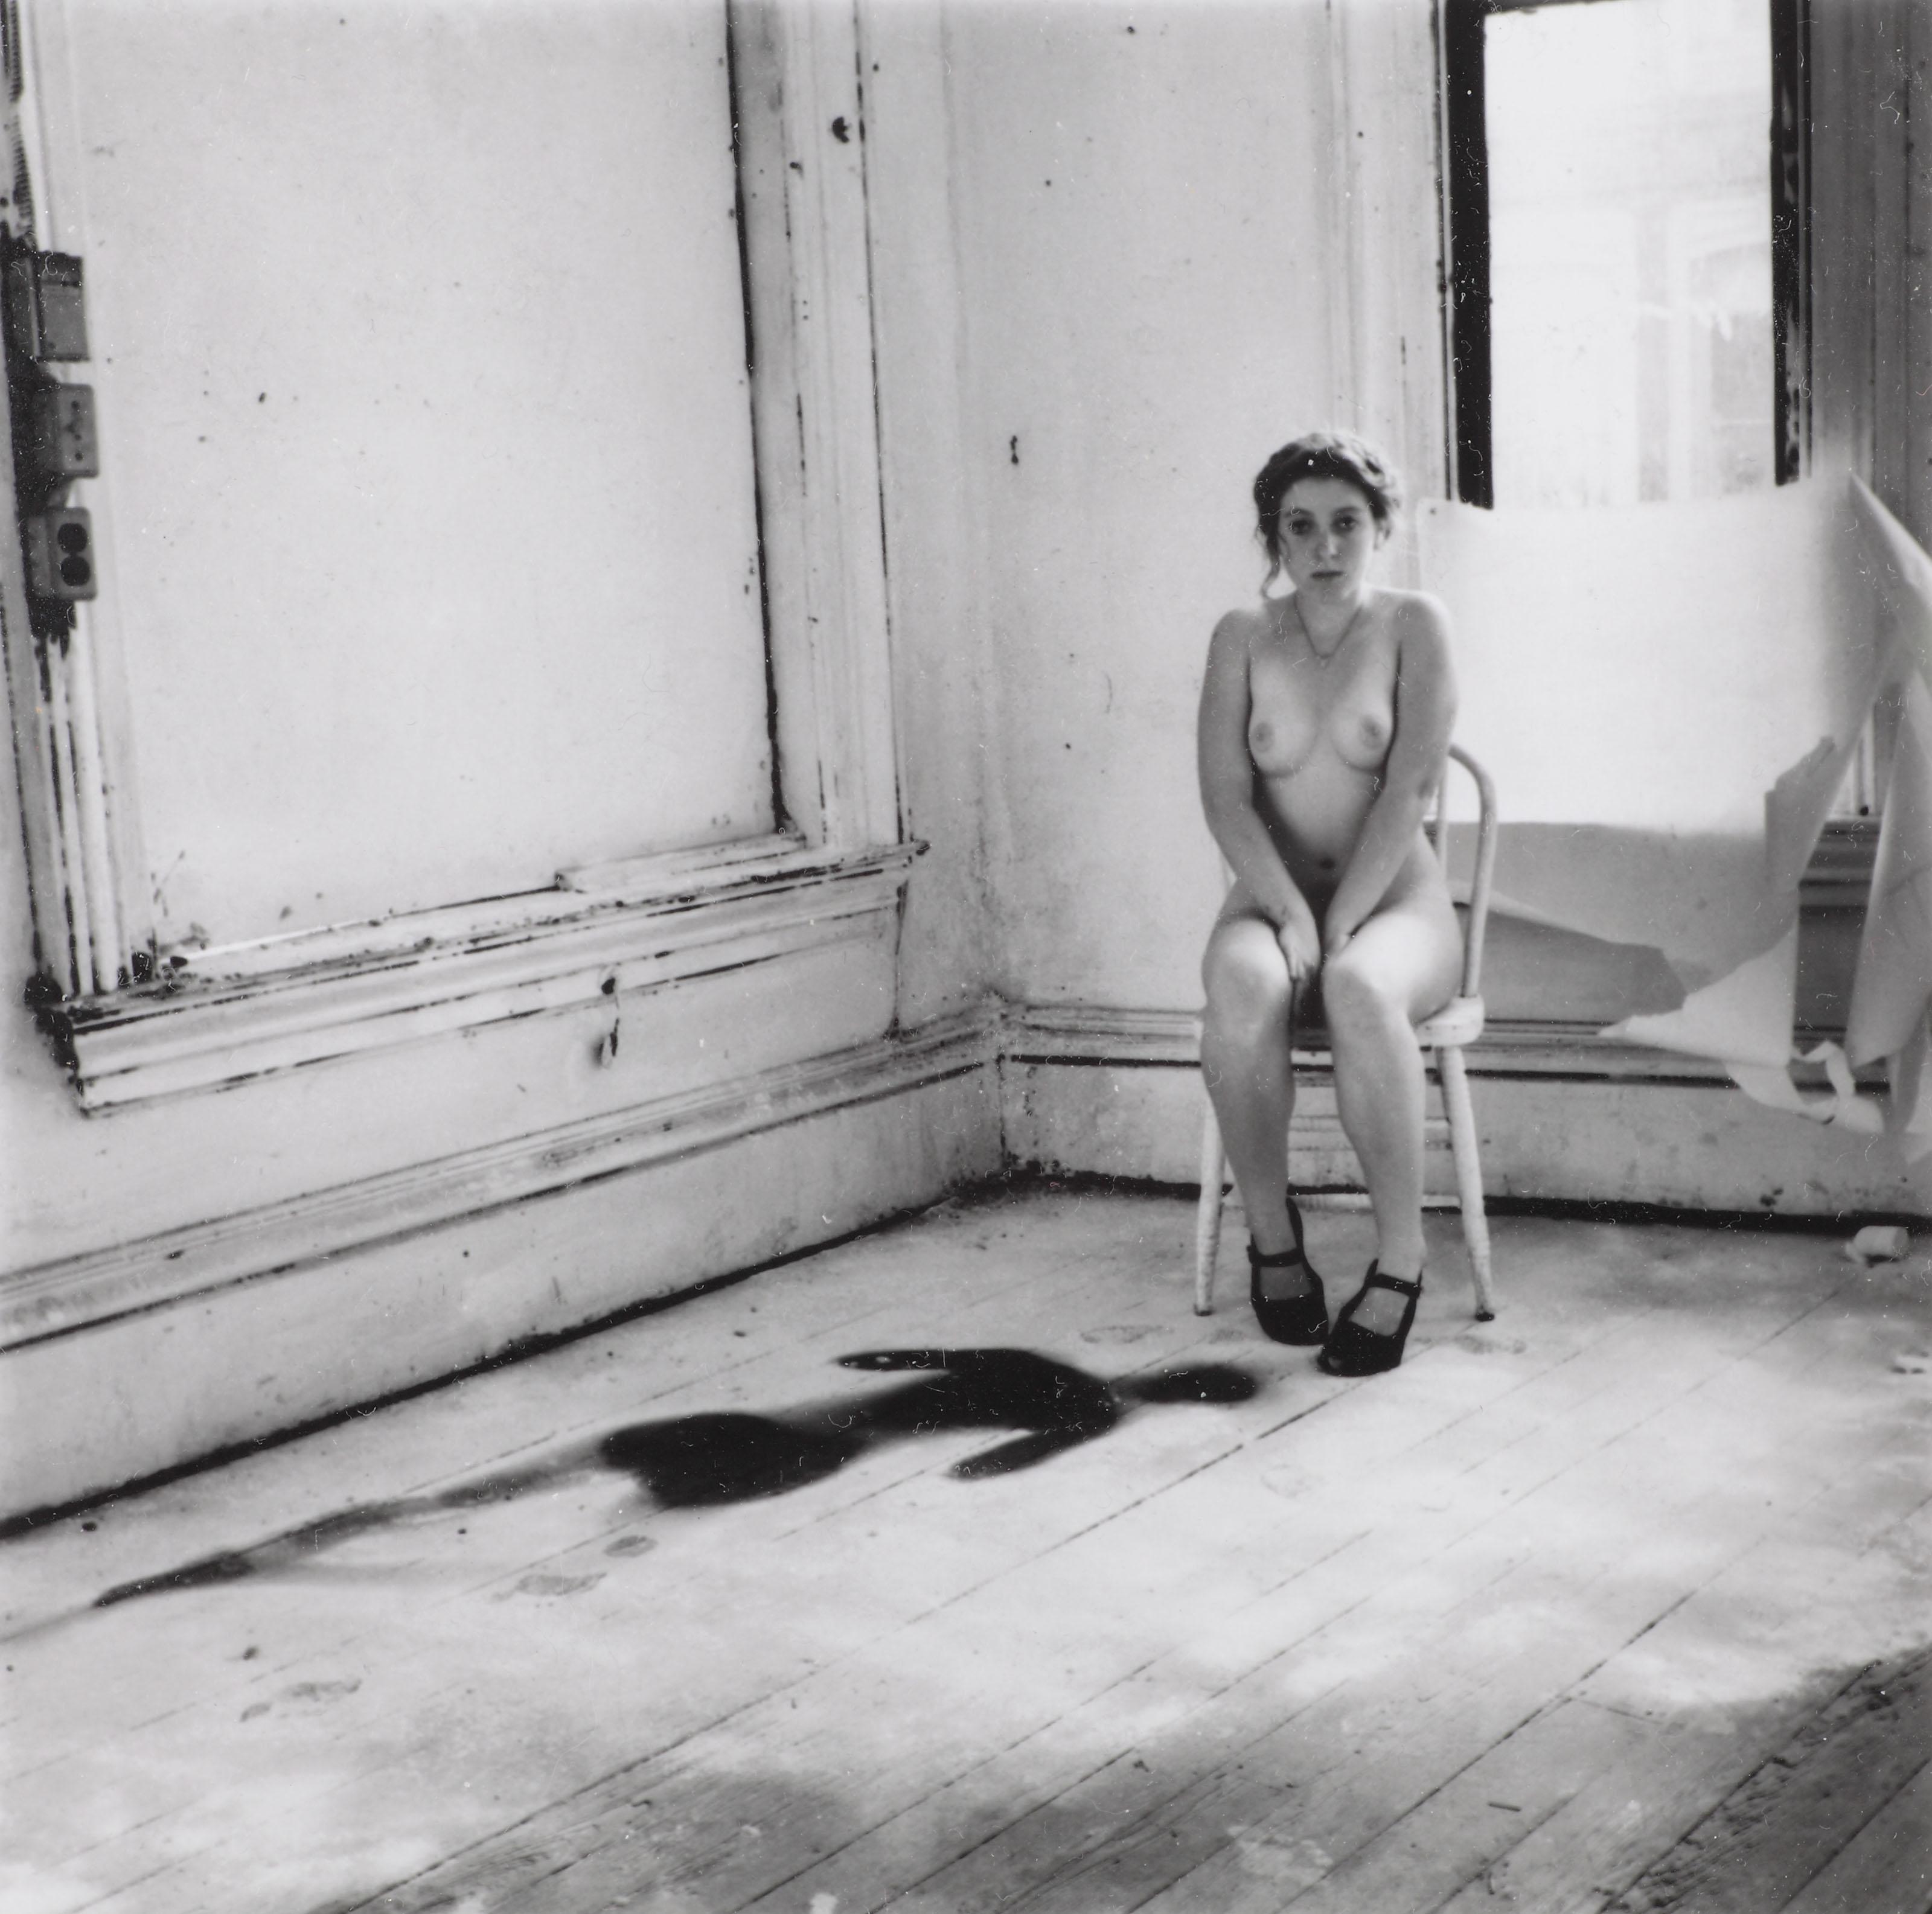 Francesca Woodman (1958-1981)